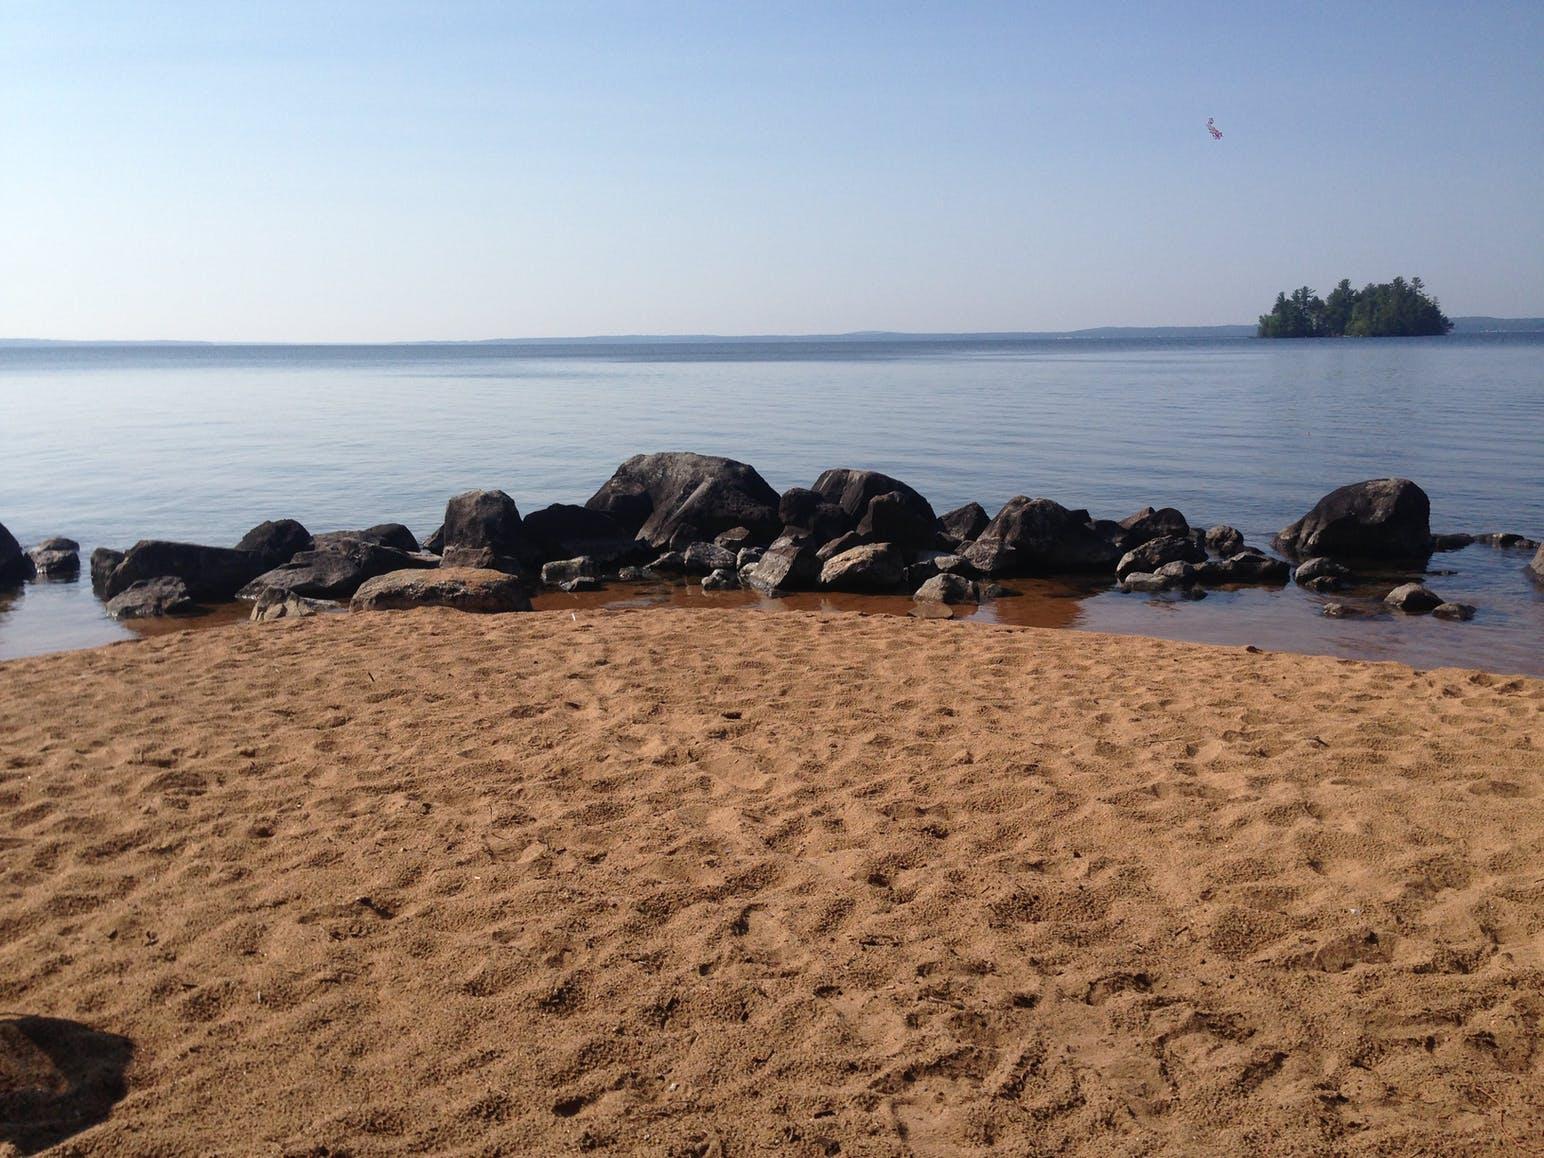 sand and rocks on beach